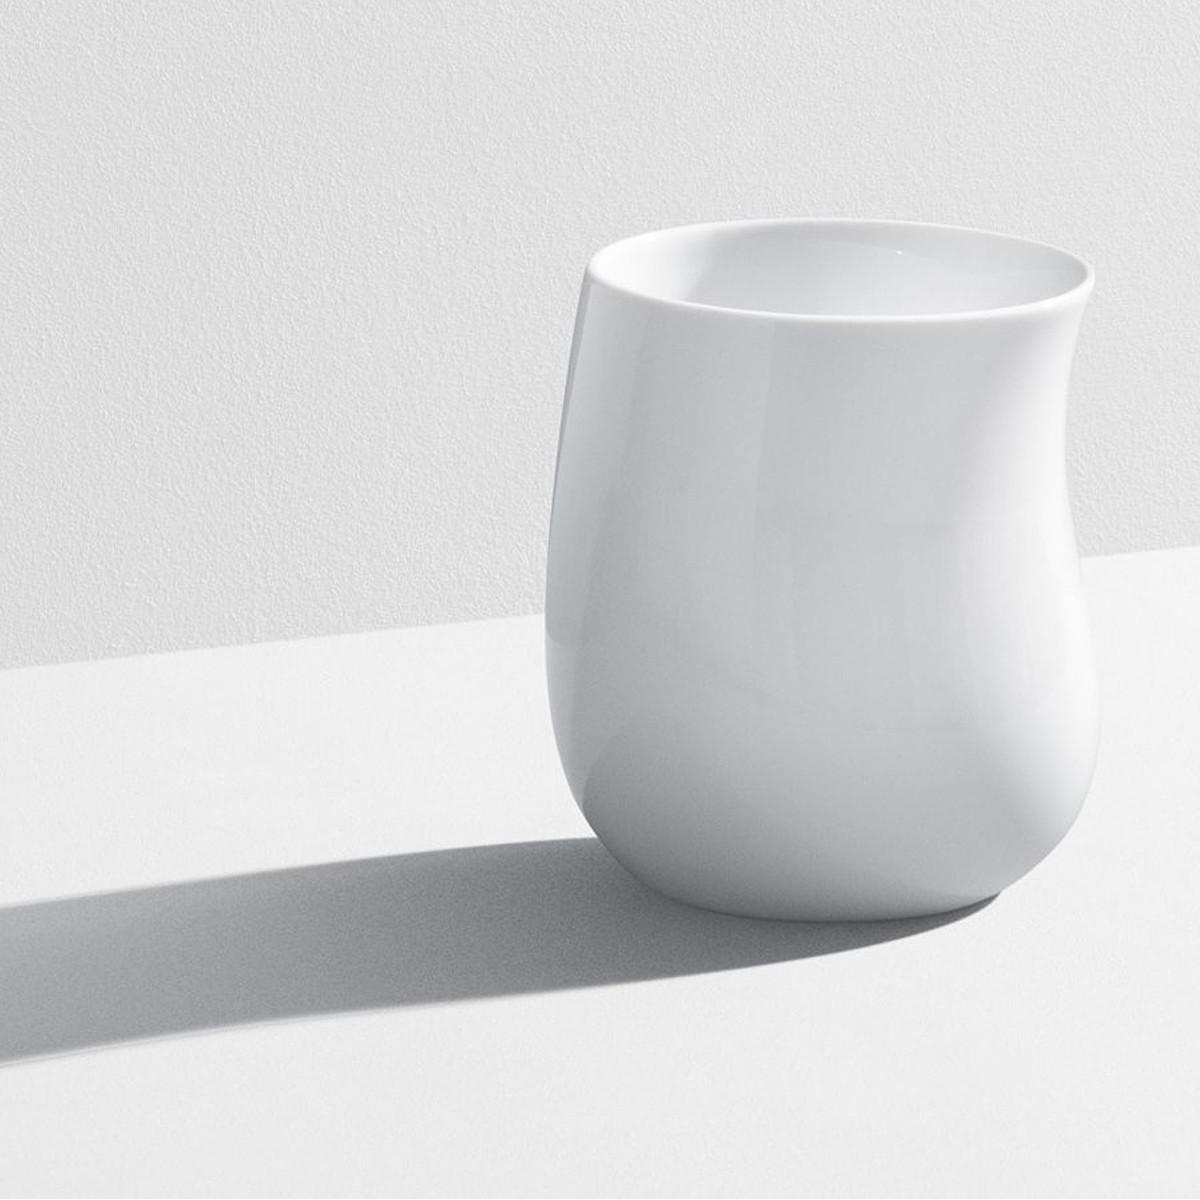 georg jensen living vase of georg jensen coffee tea coffee mugs cups cobra thermo cups throughout georg jensen cobra thermo cup porcelain 03 l 2